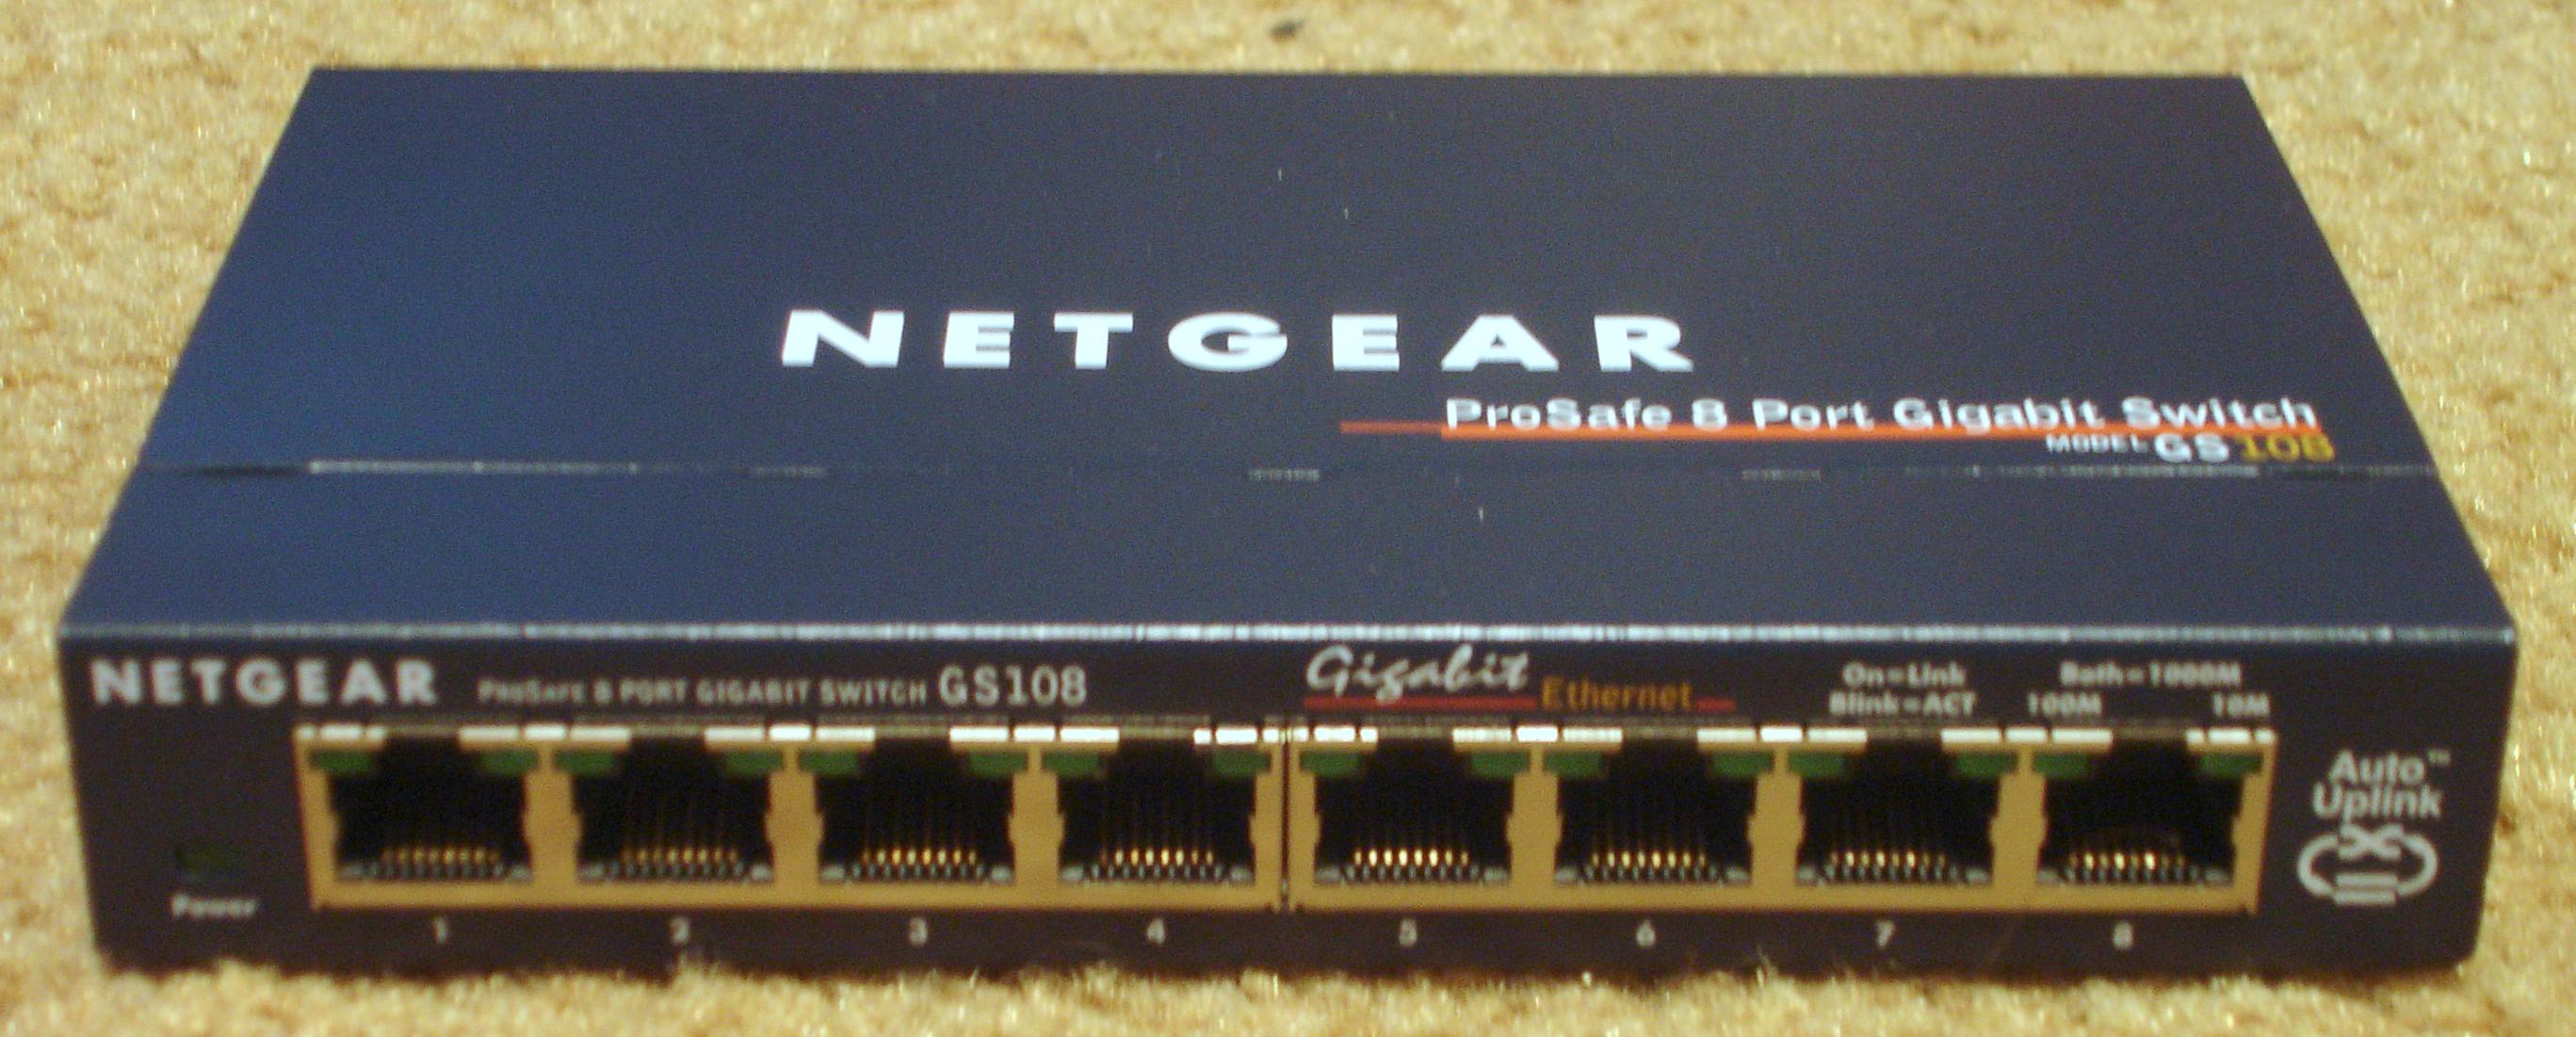 netgear prosafe 8 port gigabit switch gs108 manual